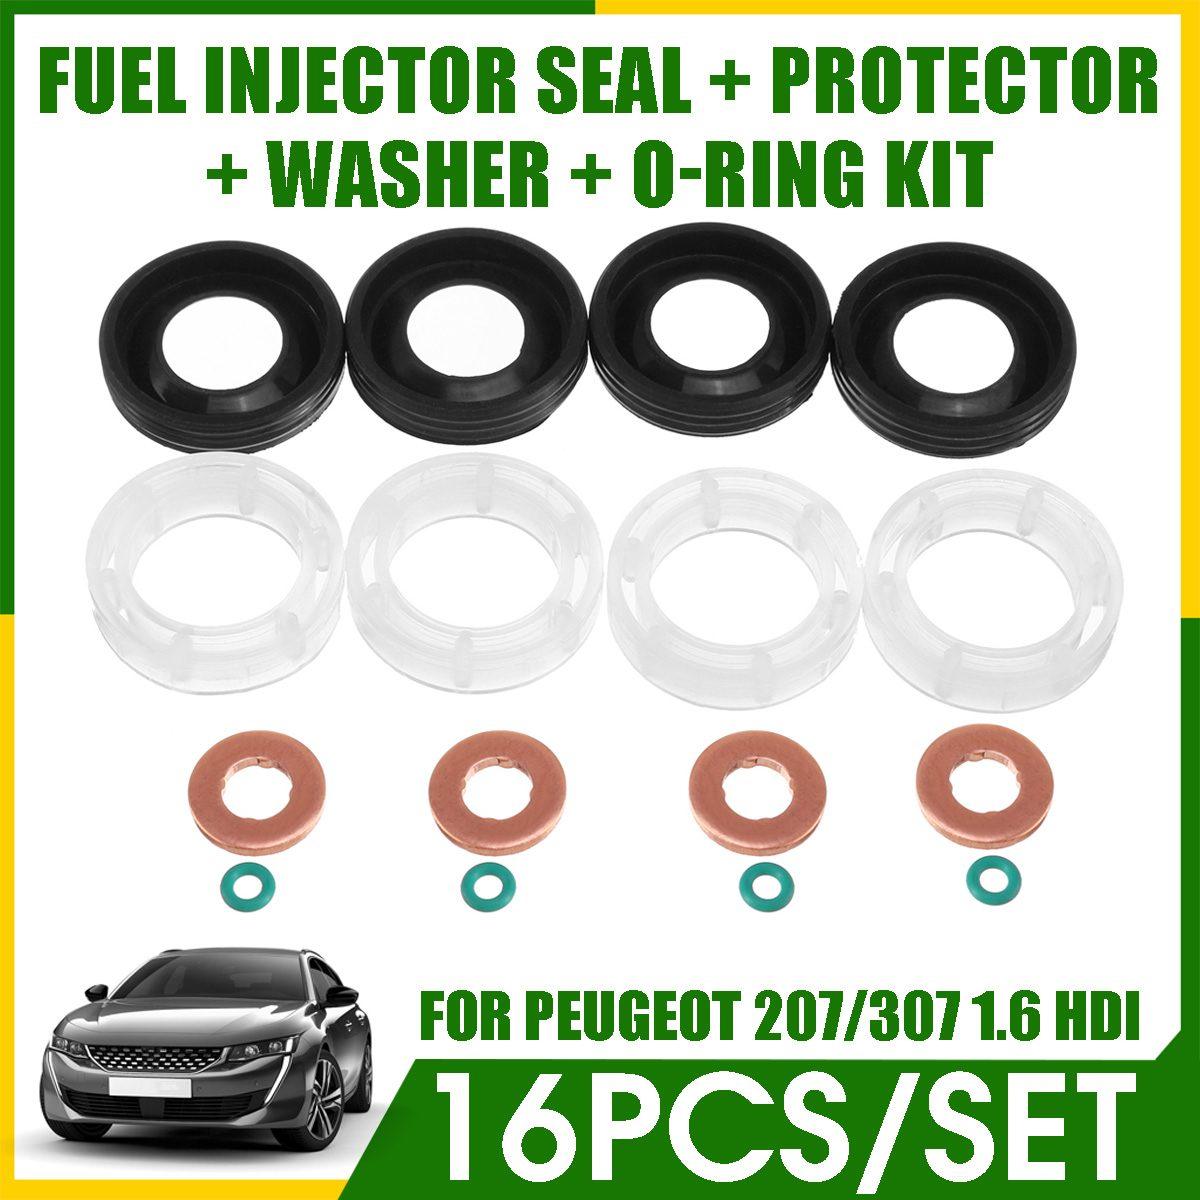 Sello inyector de combustible para coche de 16 Uds + protectores + arandela + O-RING para PEUGEOT 207/307/407 socio experto TEPEE 1,6 HDI 2004 + # 3M5Q-9R524-AA